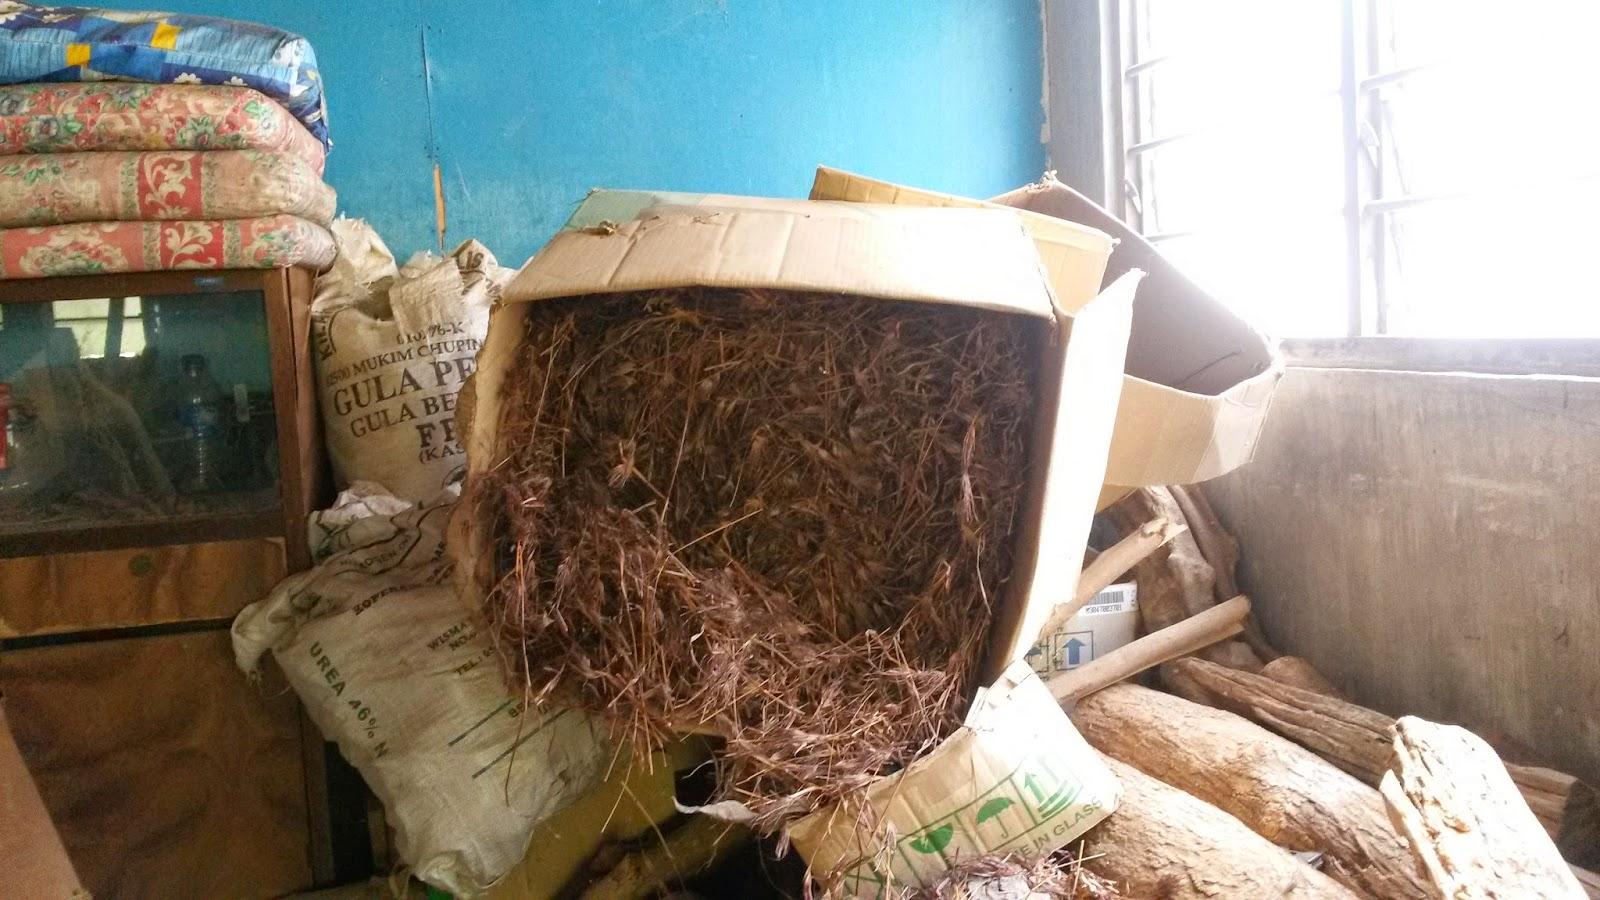 Rumah Herba & Akar kayu, resdung, tradisional medicine, janggut tok adam